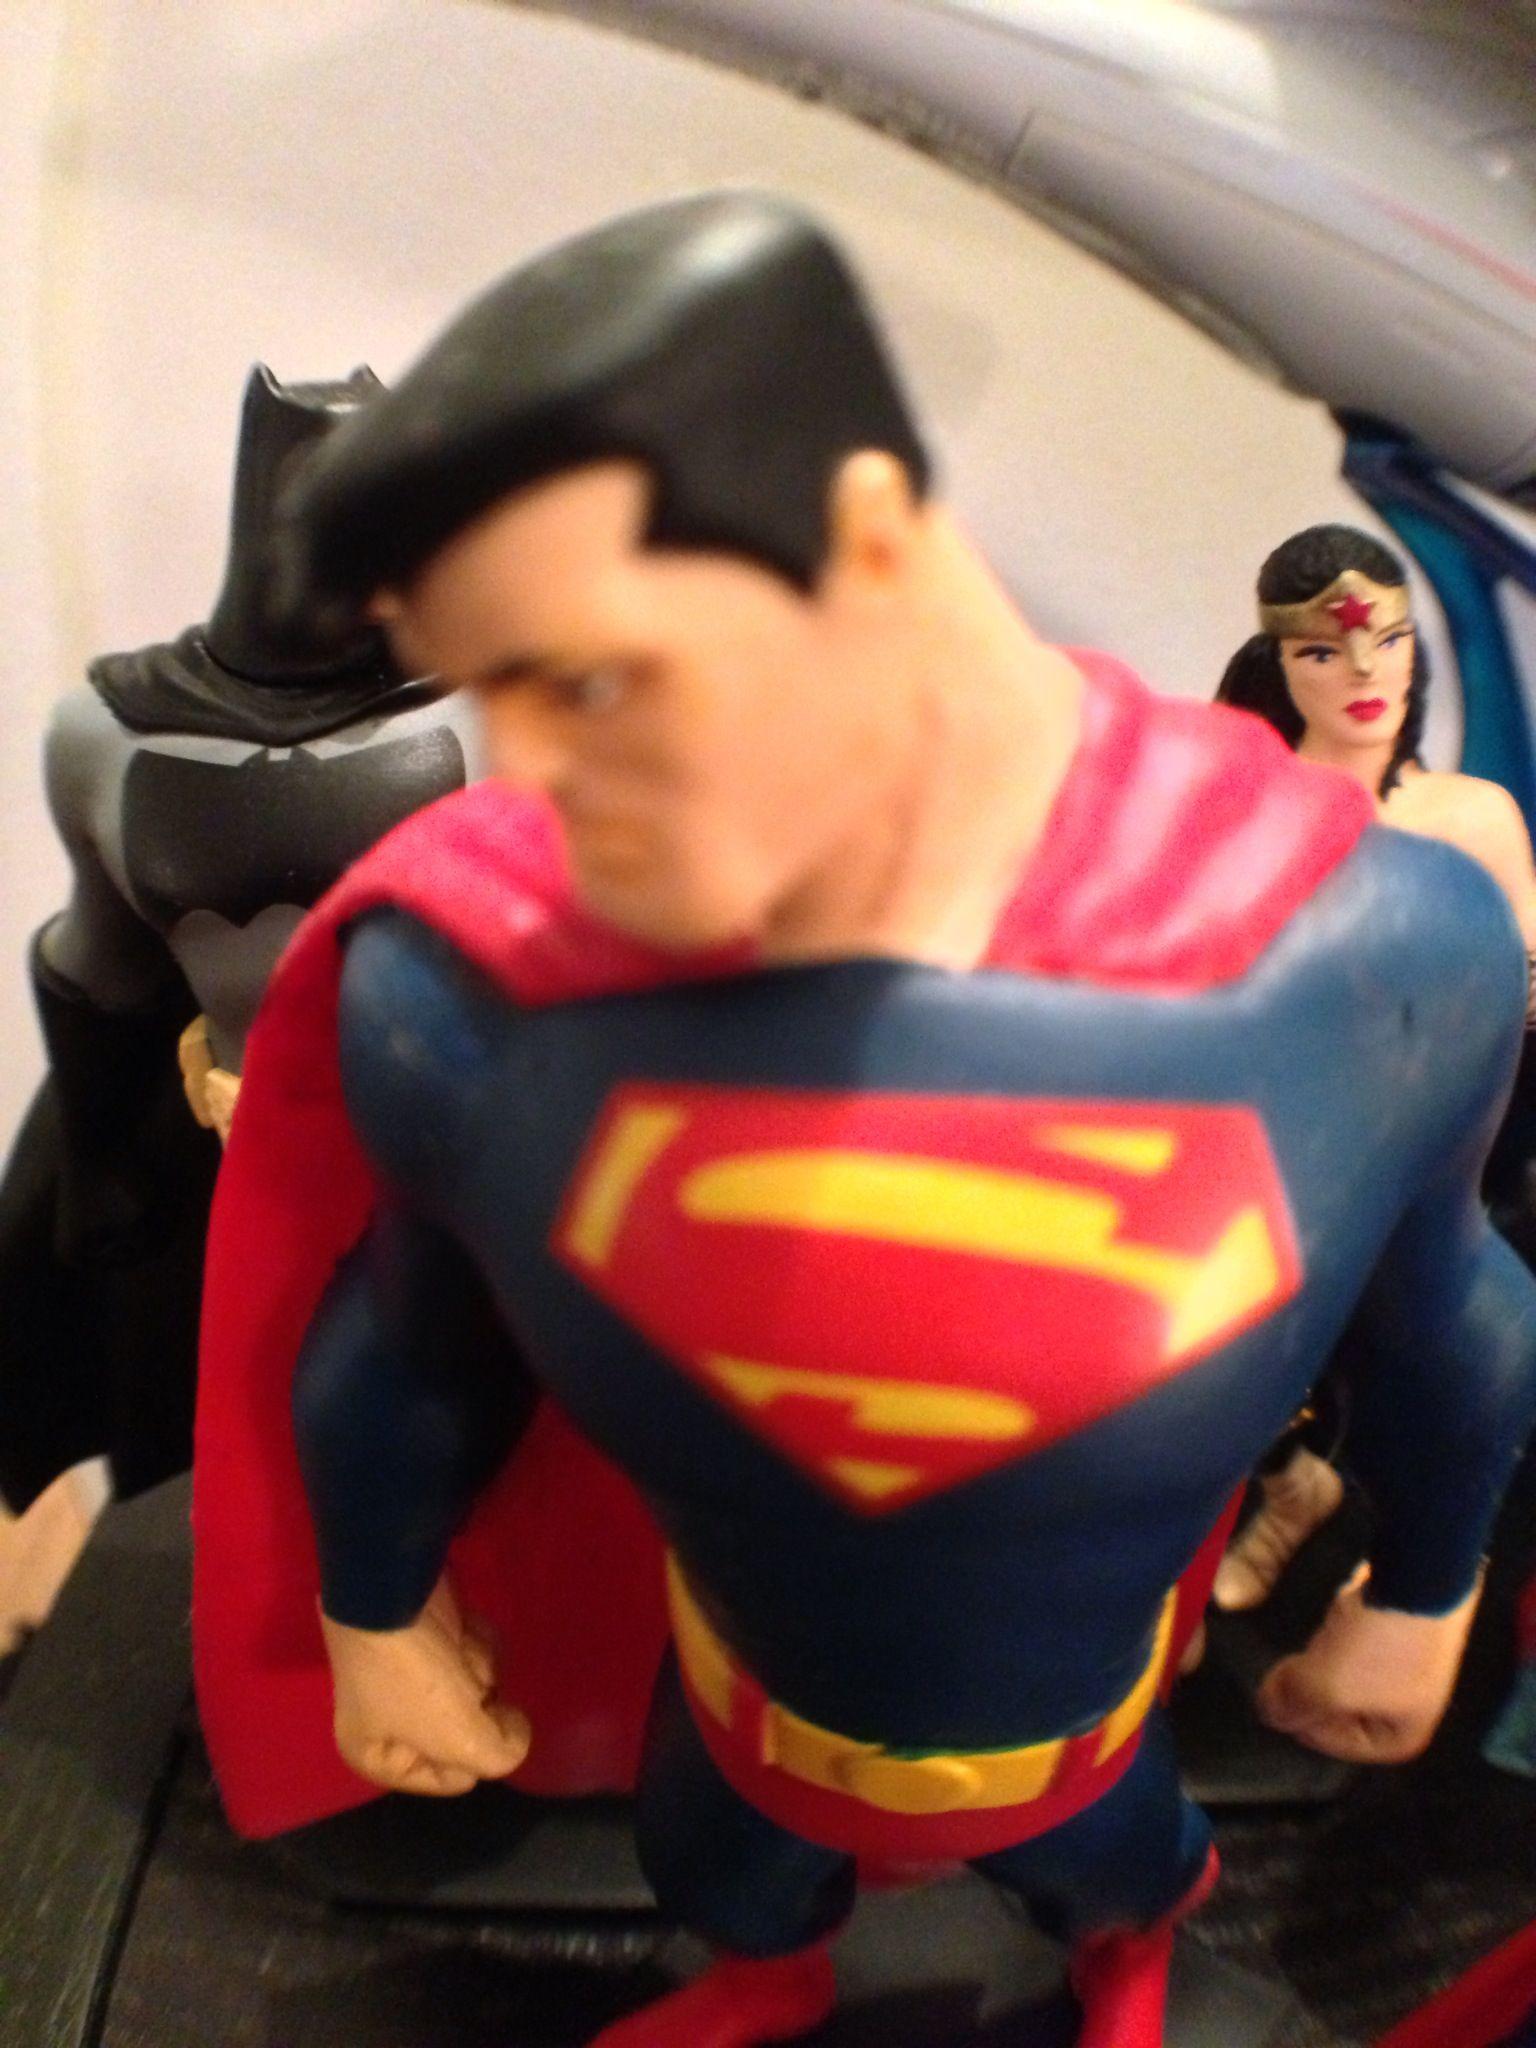 Superman, Batman and Wonder Woman photographed by Kevin Cardani on the iPhone 5 using the Instagram app #superman #toys #actionfigure #DC #batman #wonderwoman